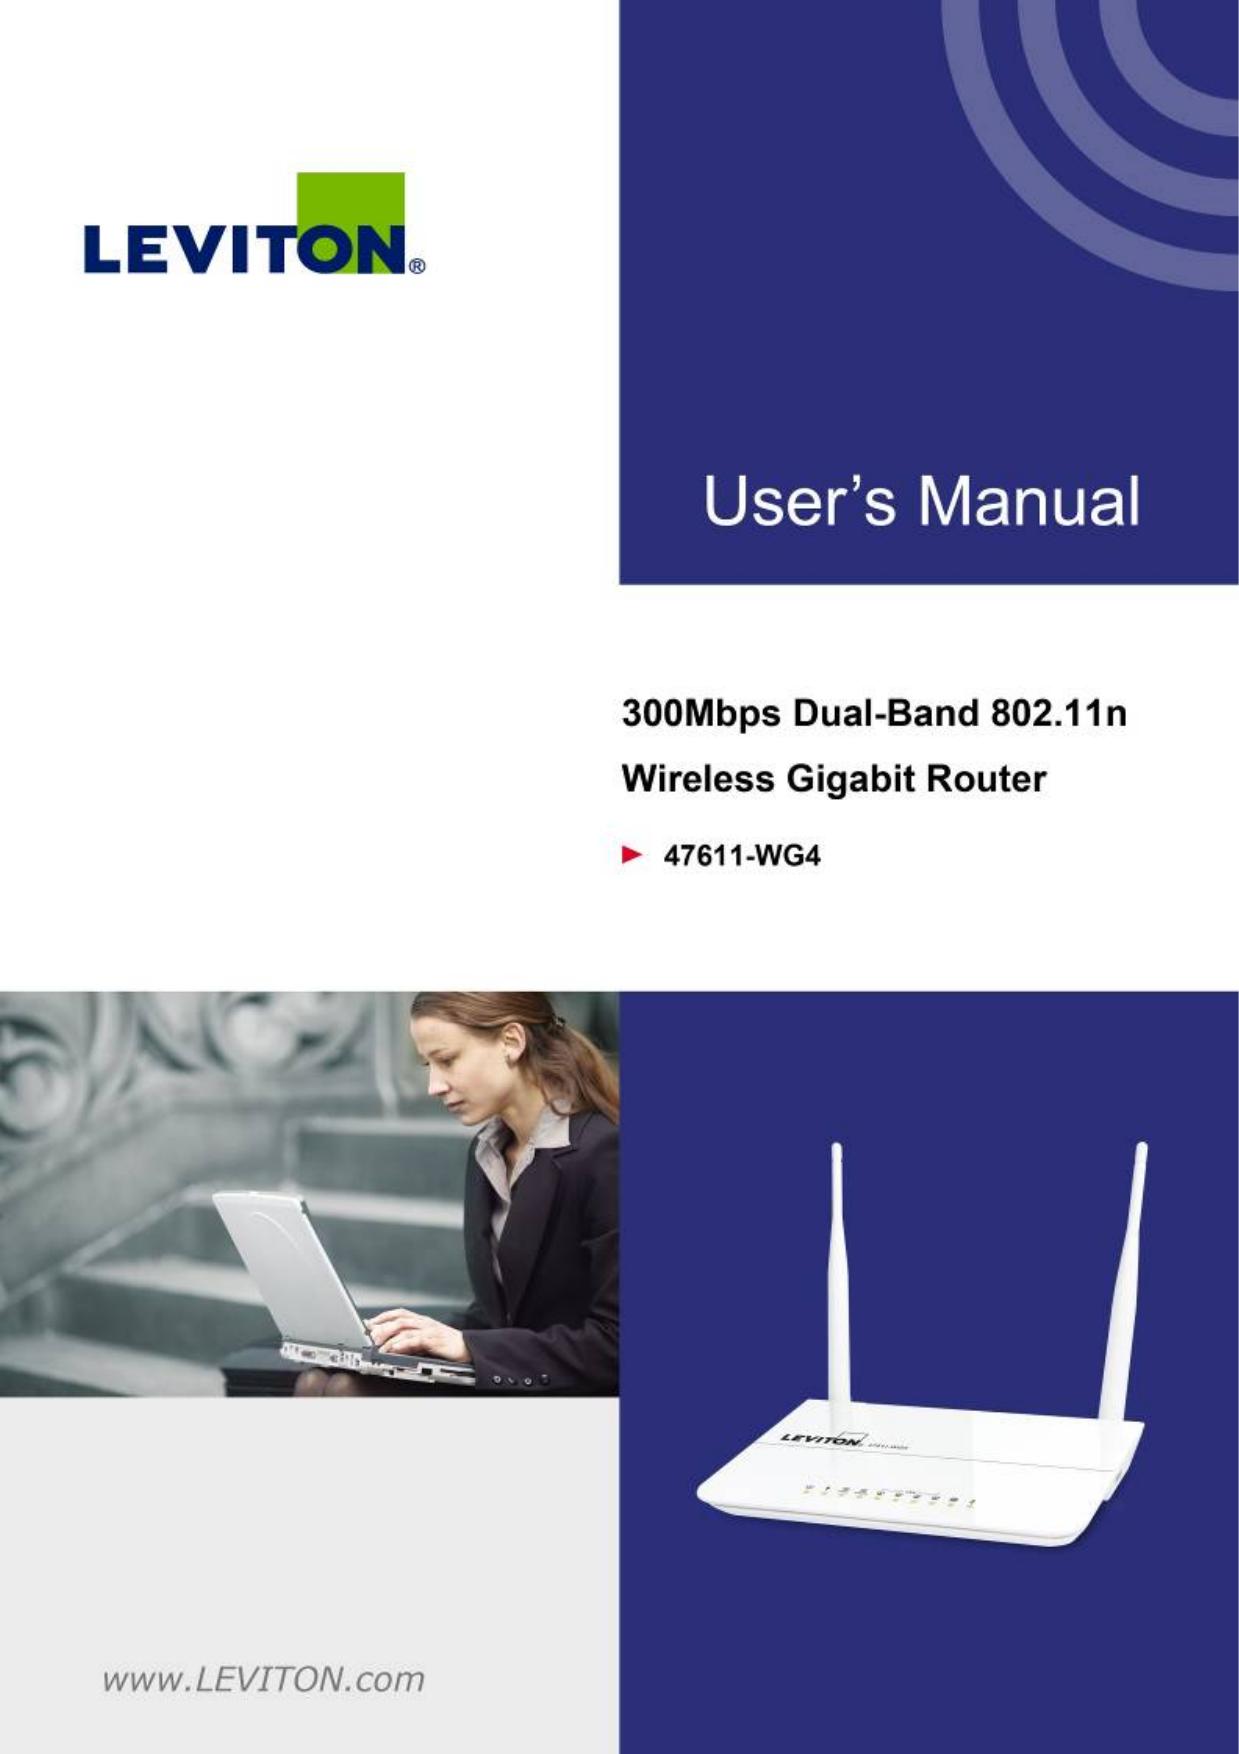 Leviton 47611-WG4 300Mbps Daul Band 802.11n Wireless Gigabit Router ...